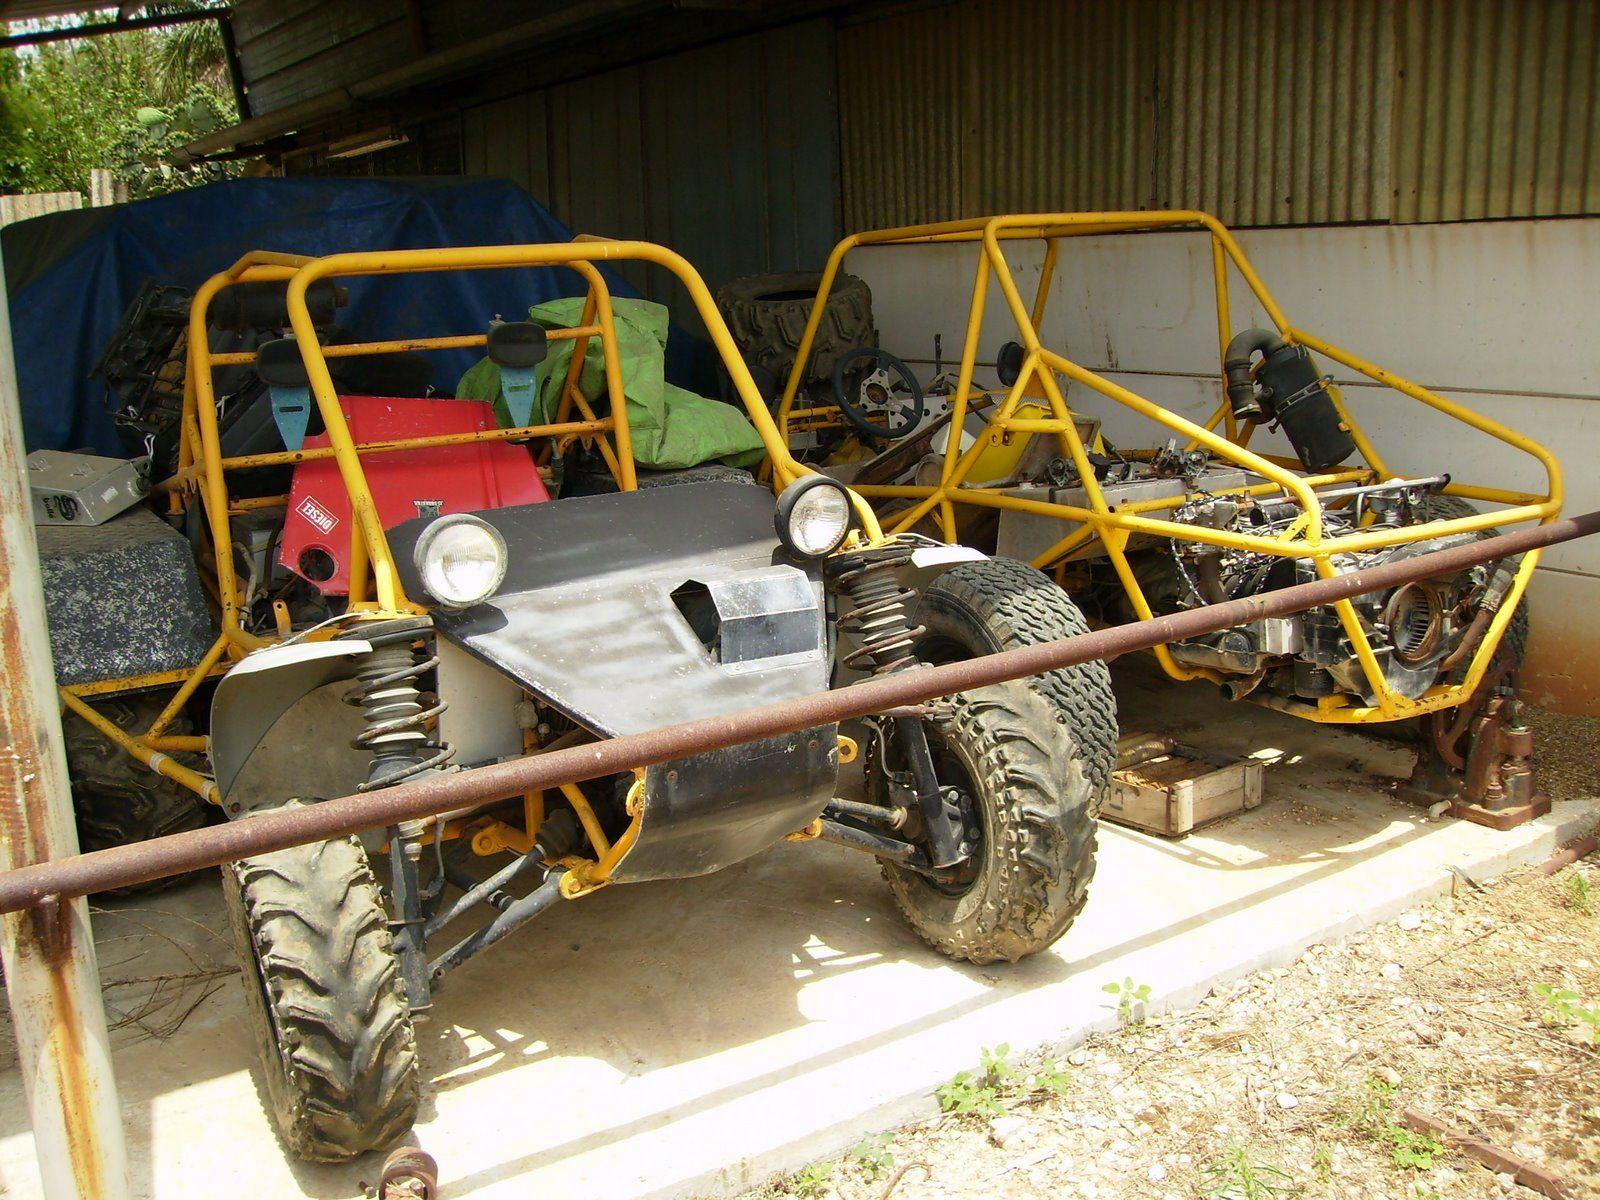 small bagi 6x6 small 2x4 | Family self-construction vehicles ...